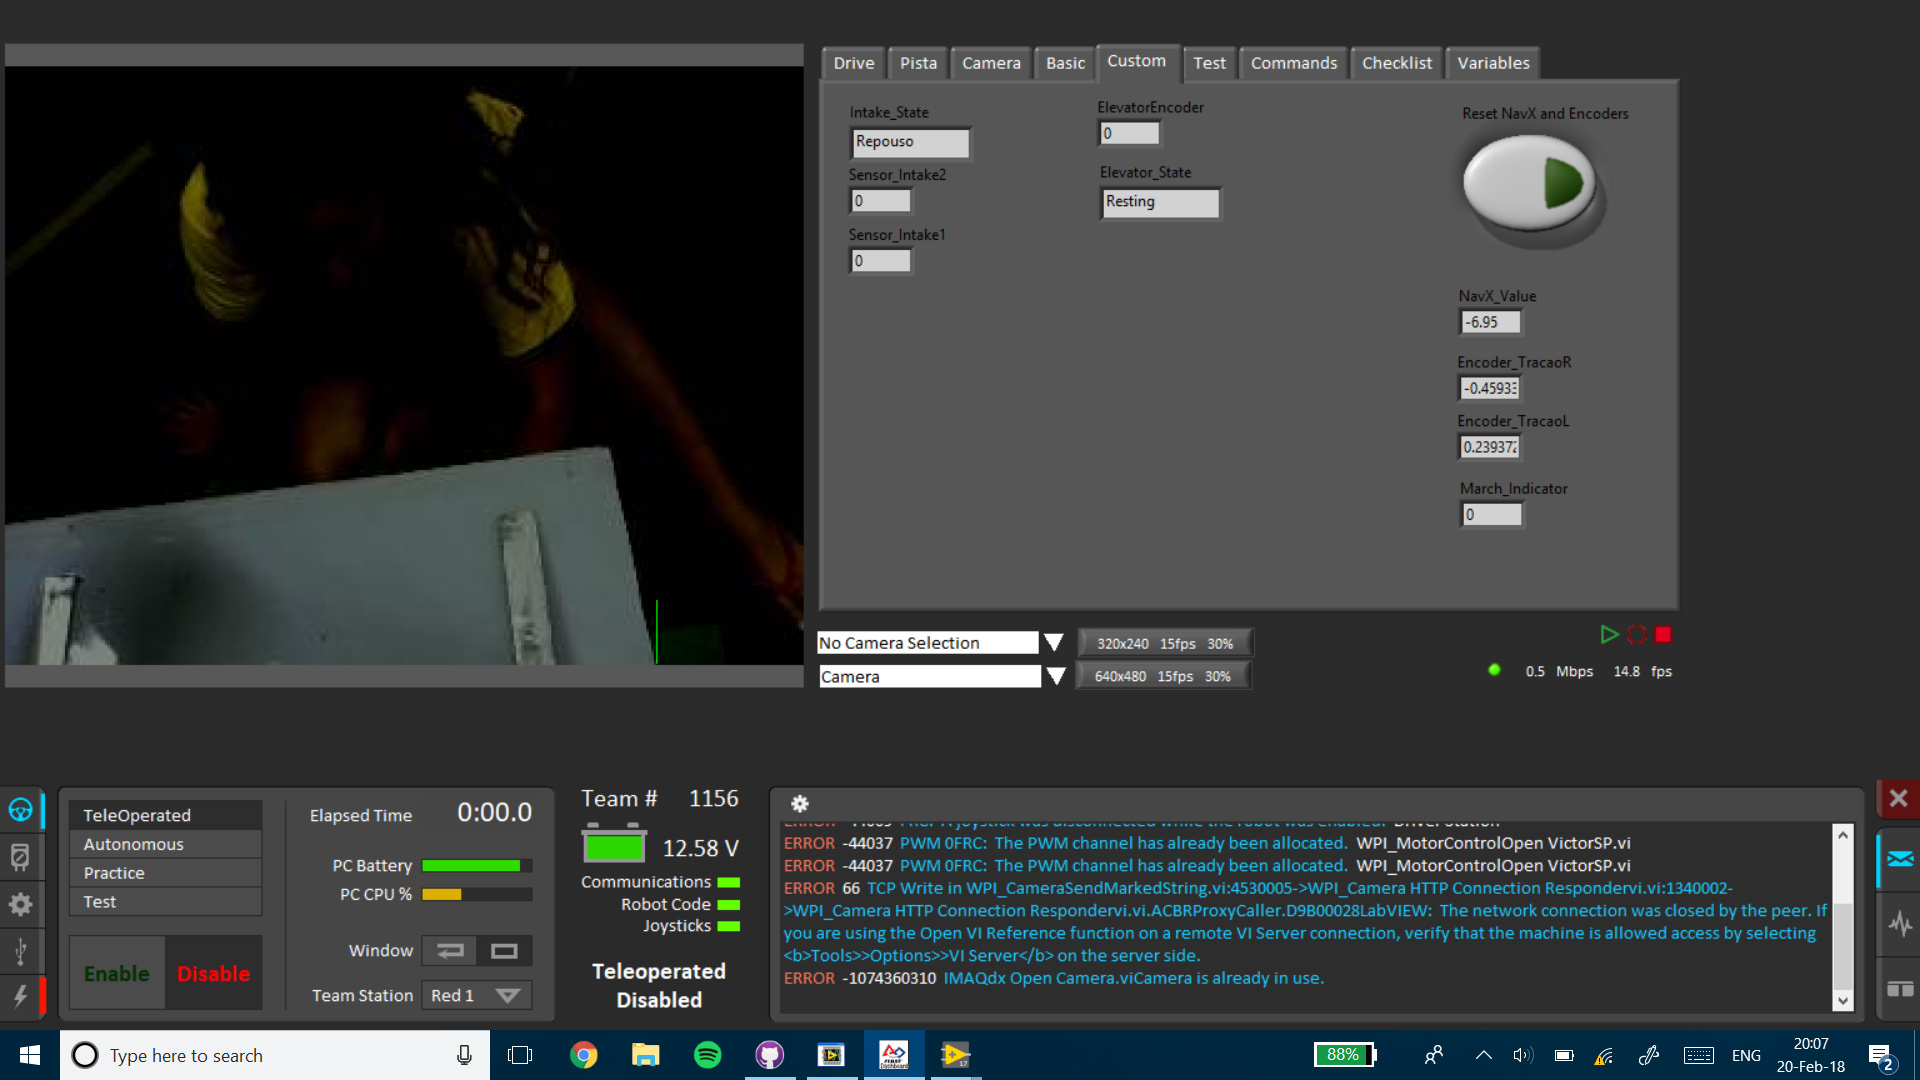 Logitech camera issue - dark image on dashboard